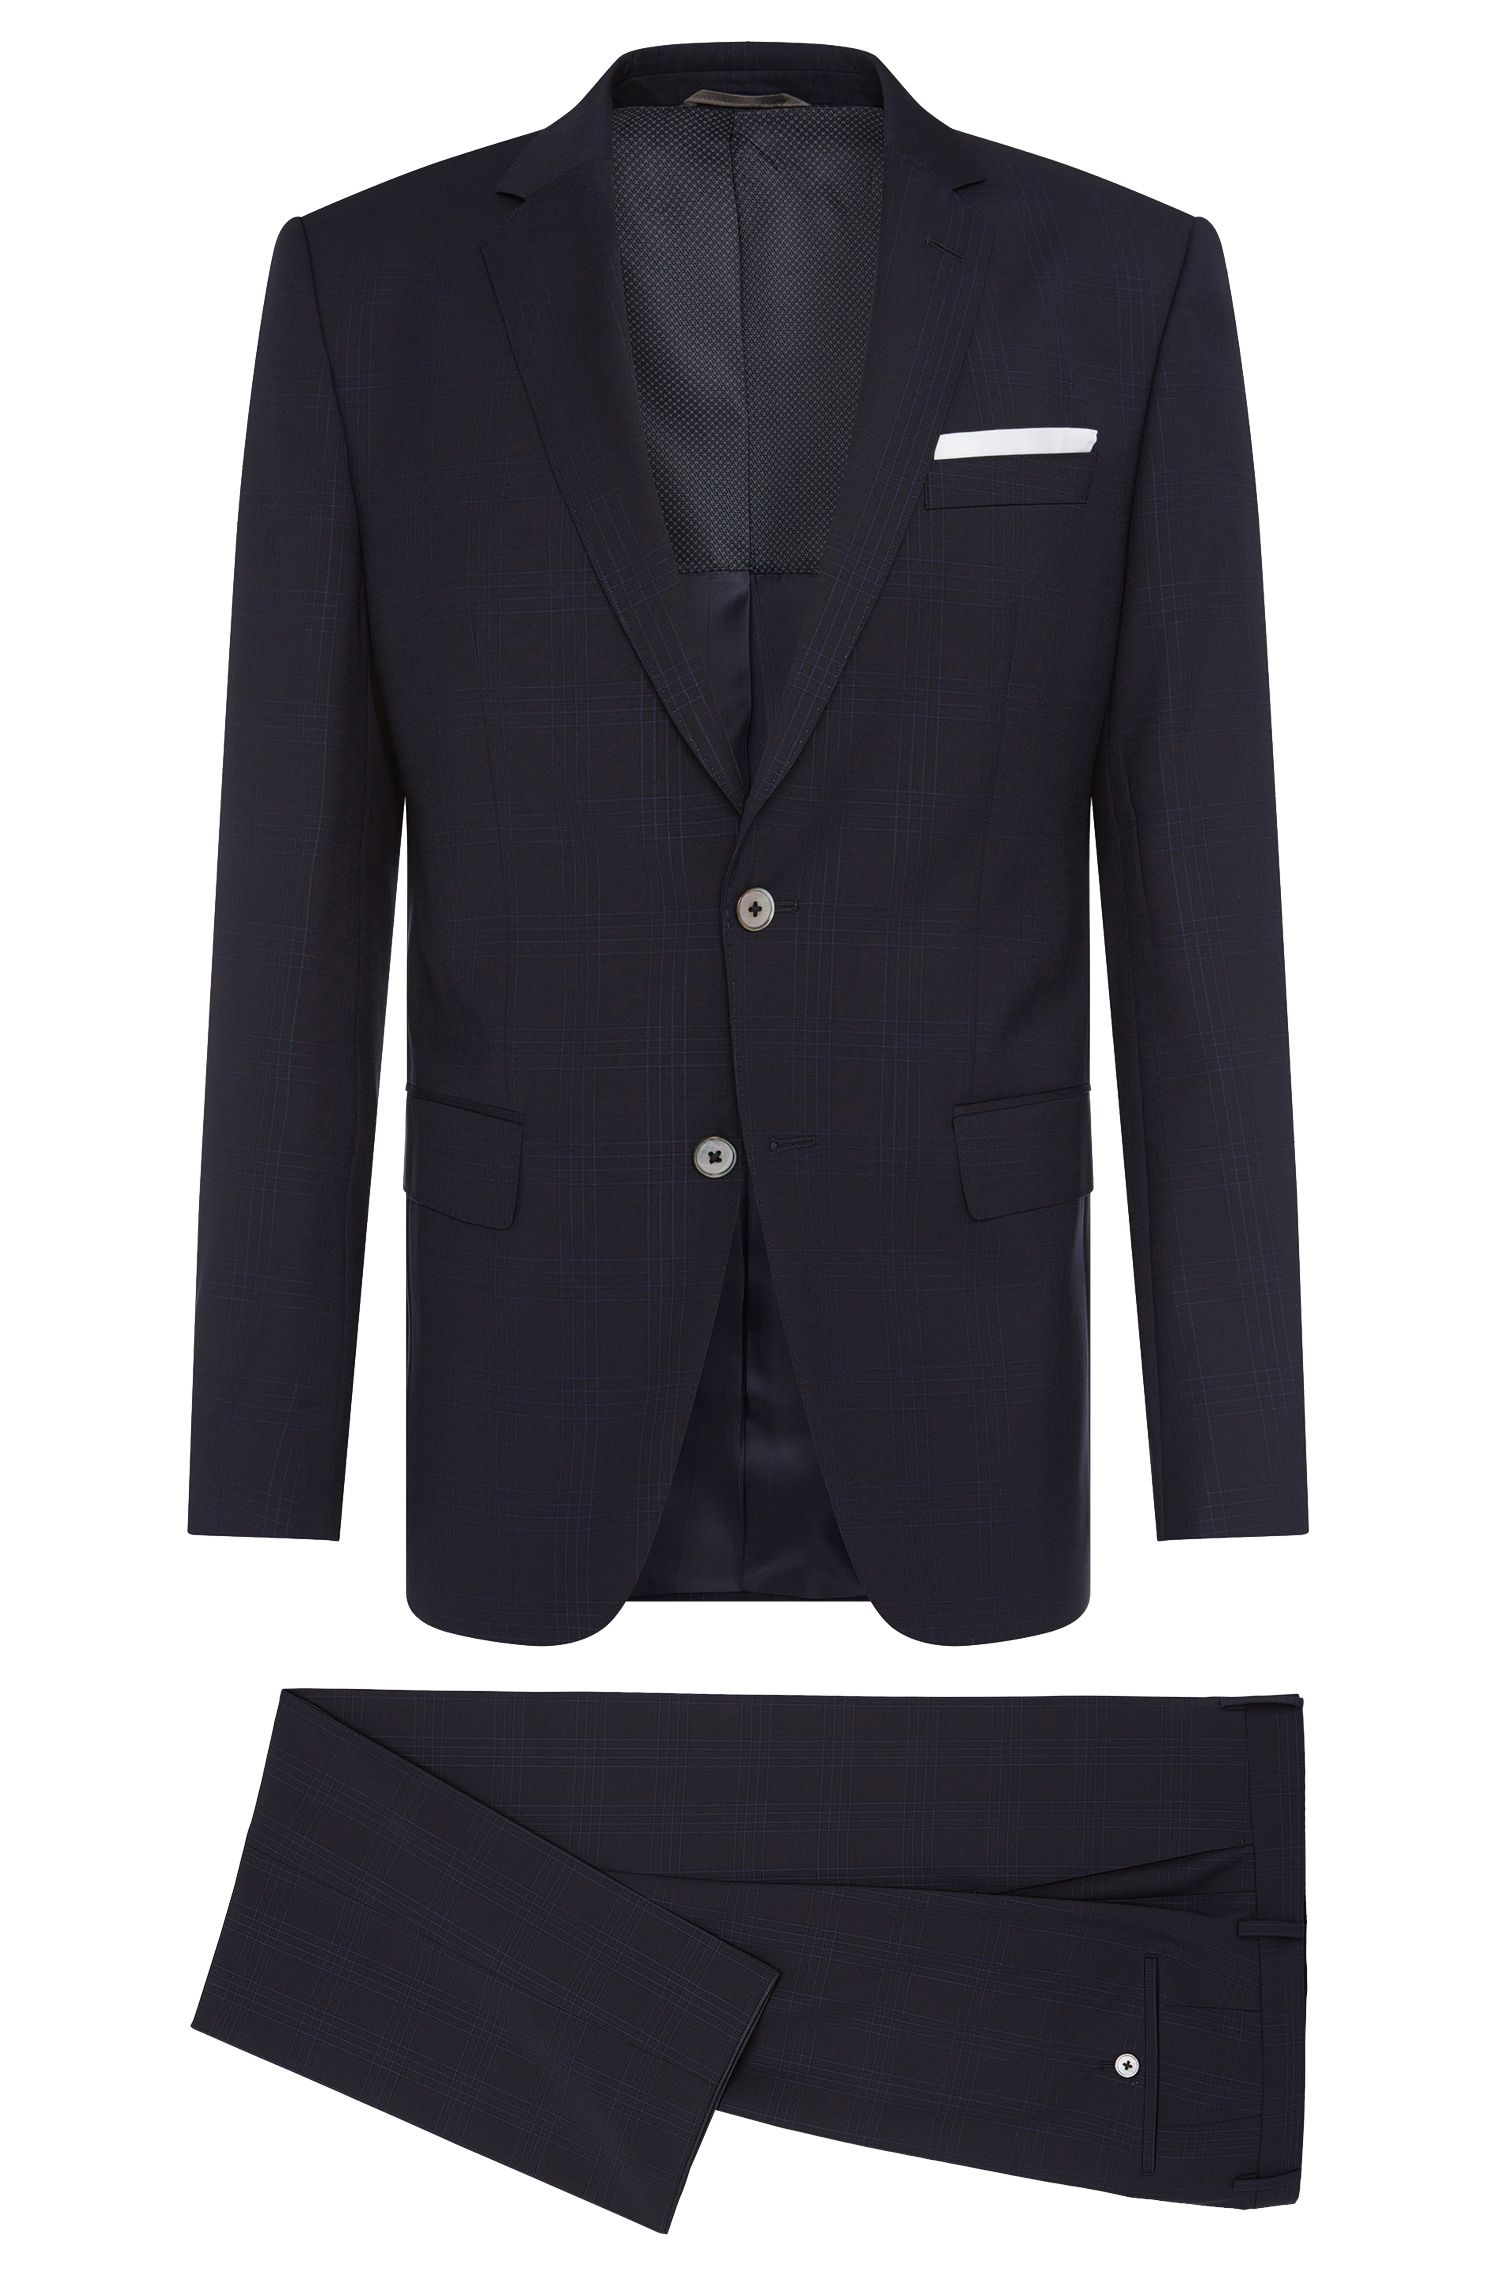 'Hutson/Gander' | Slim Fit, Super 110 Italian Virgin Wool Suit